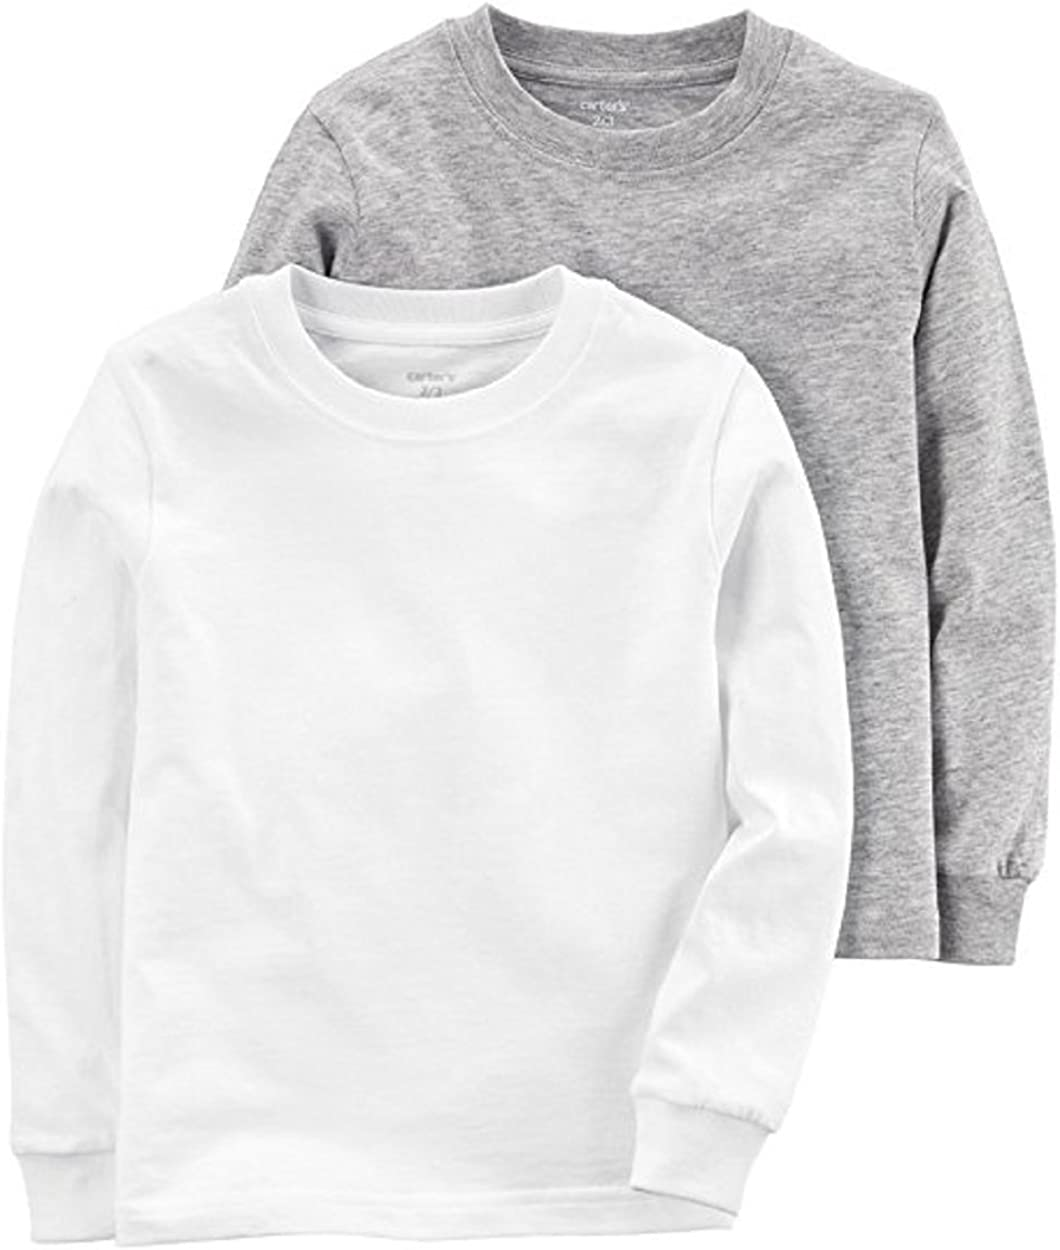 Carter's Boy`s Long Sleeve 2-Pack Cotton Undershirts